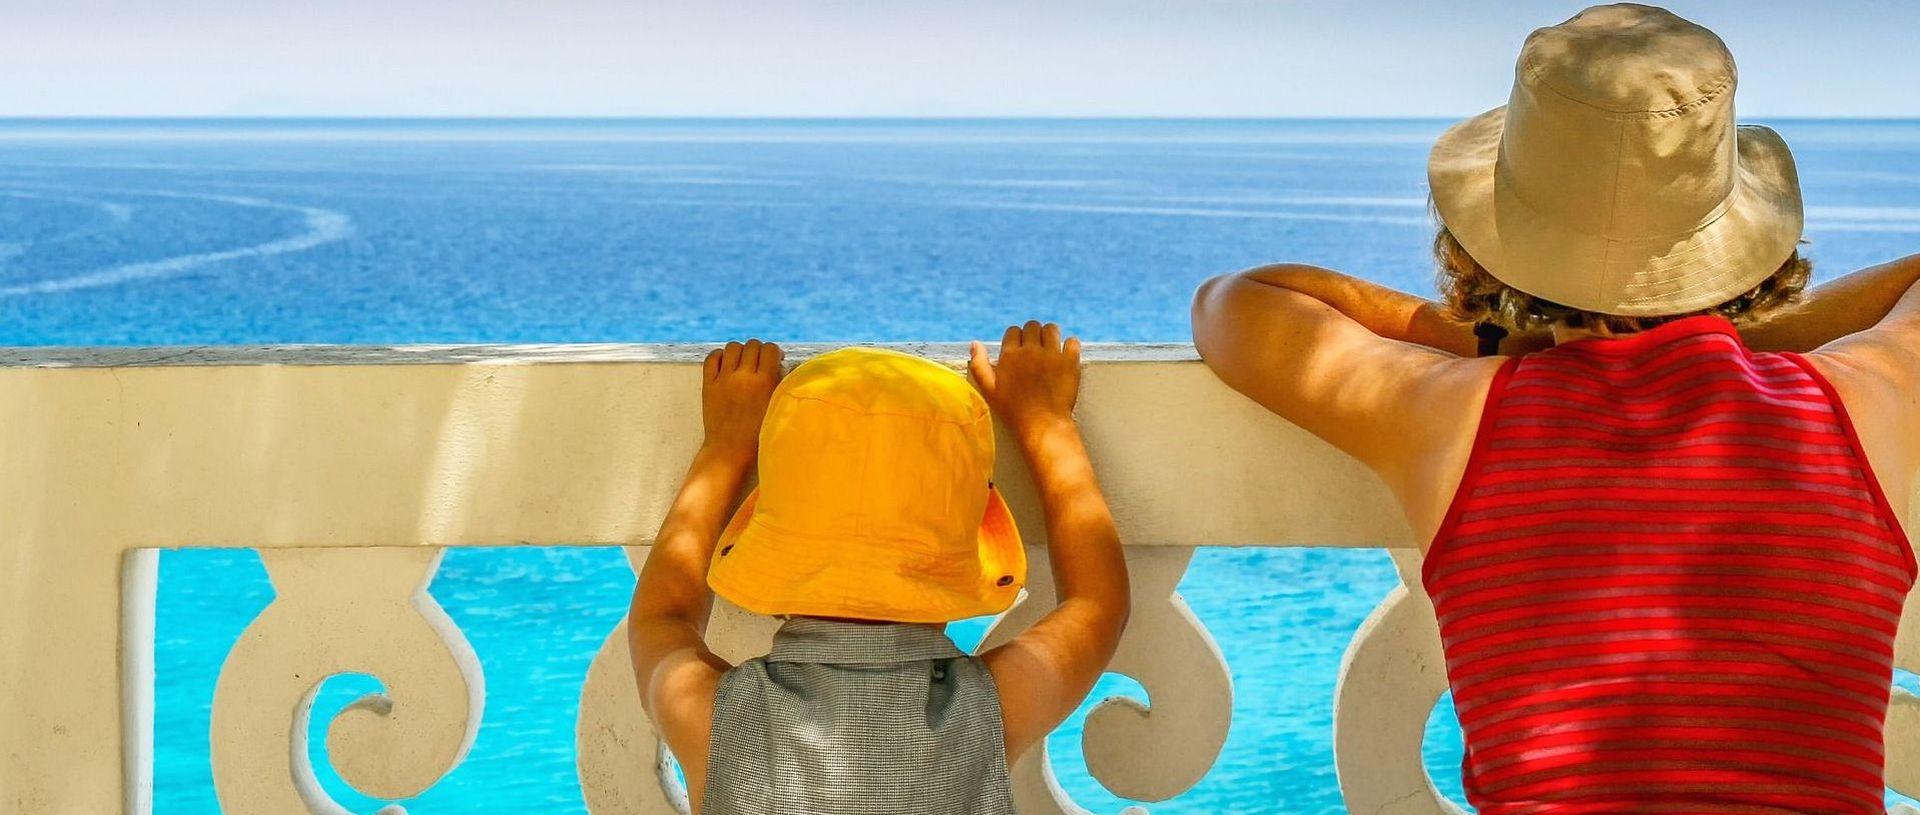 Case vacanza per famiglie